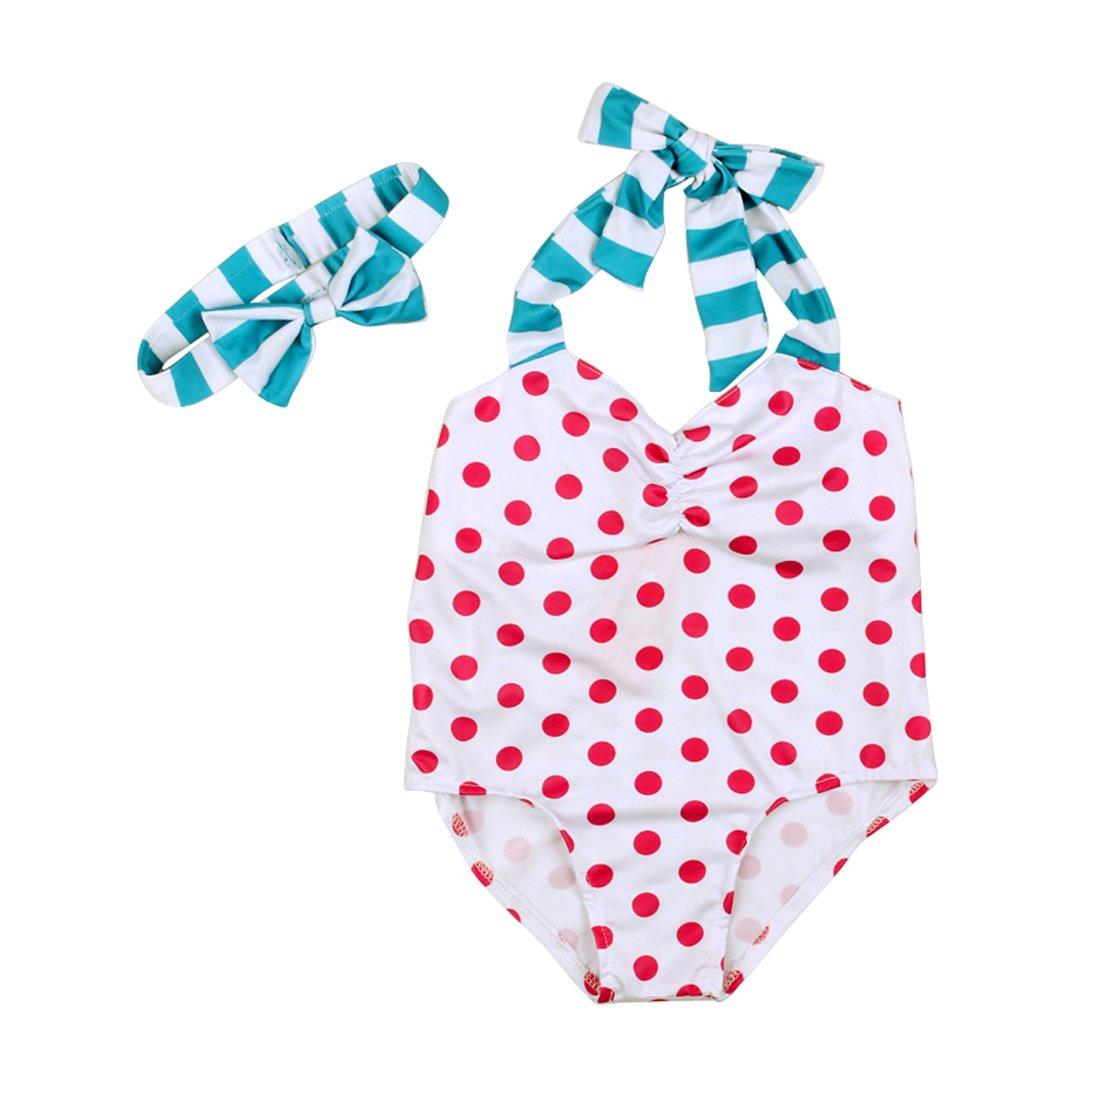 EITC Little Girls Summer Swimwear 2pcs Polka Dots Swimsuit with Cute Headband 6T